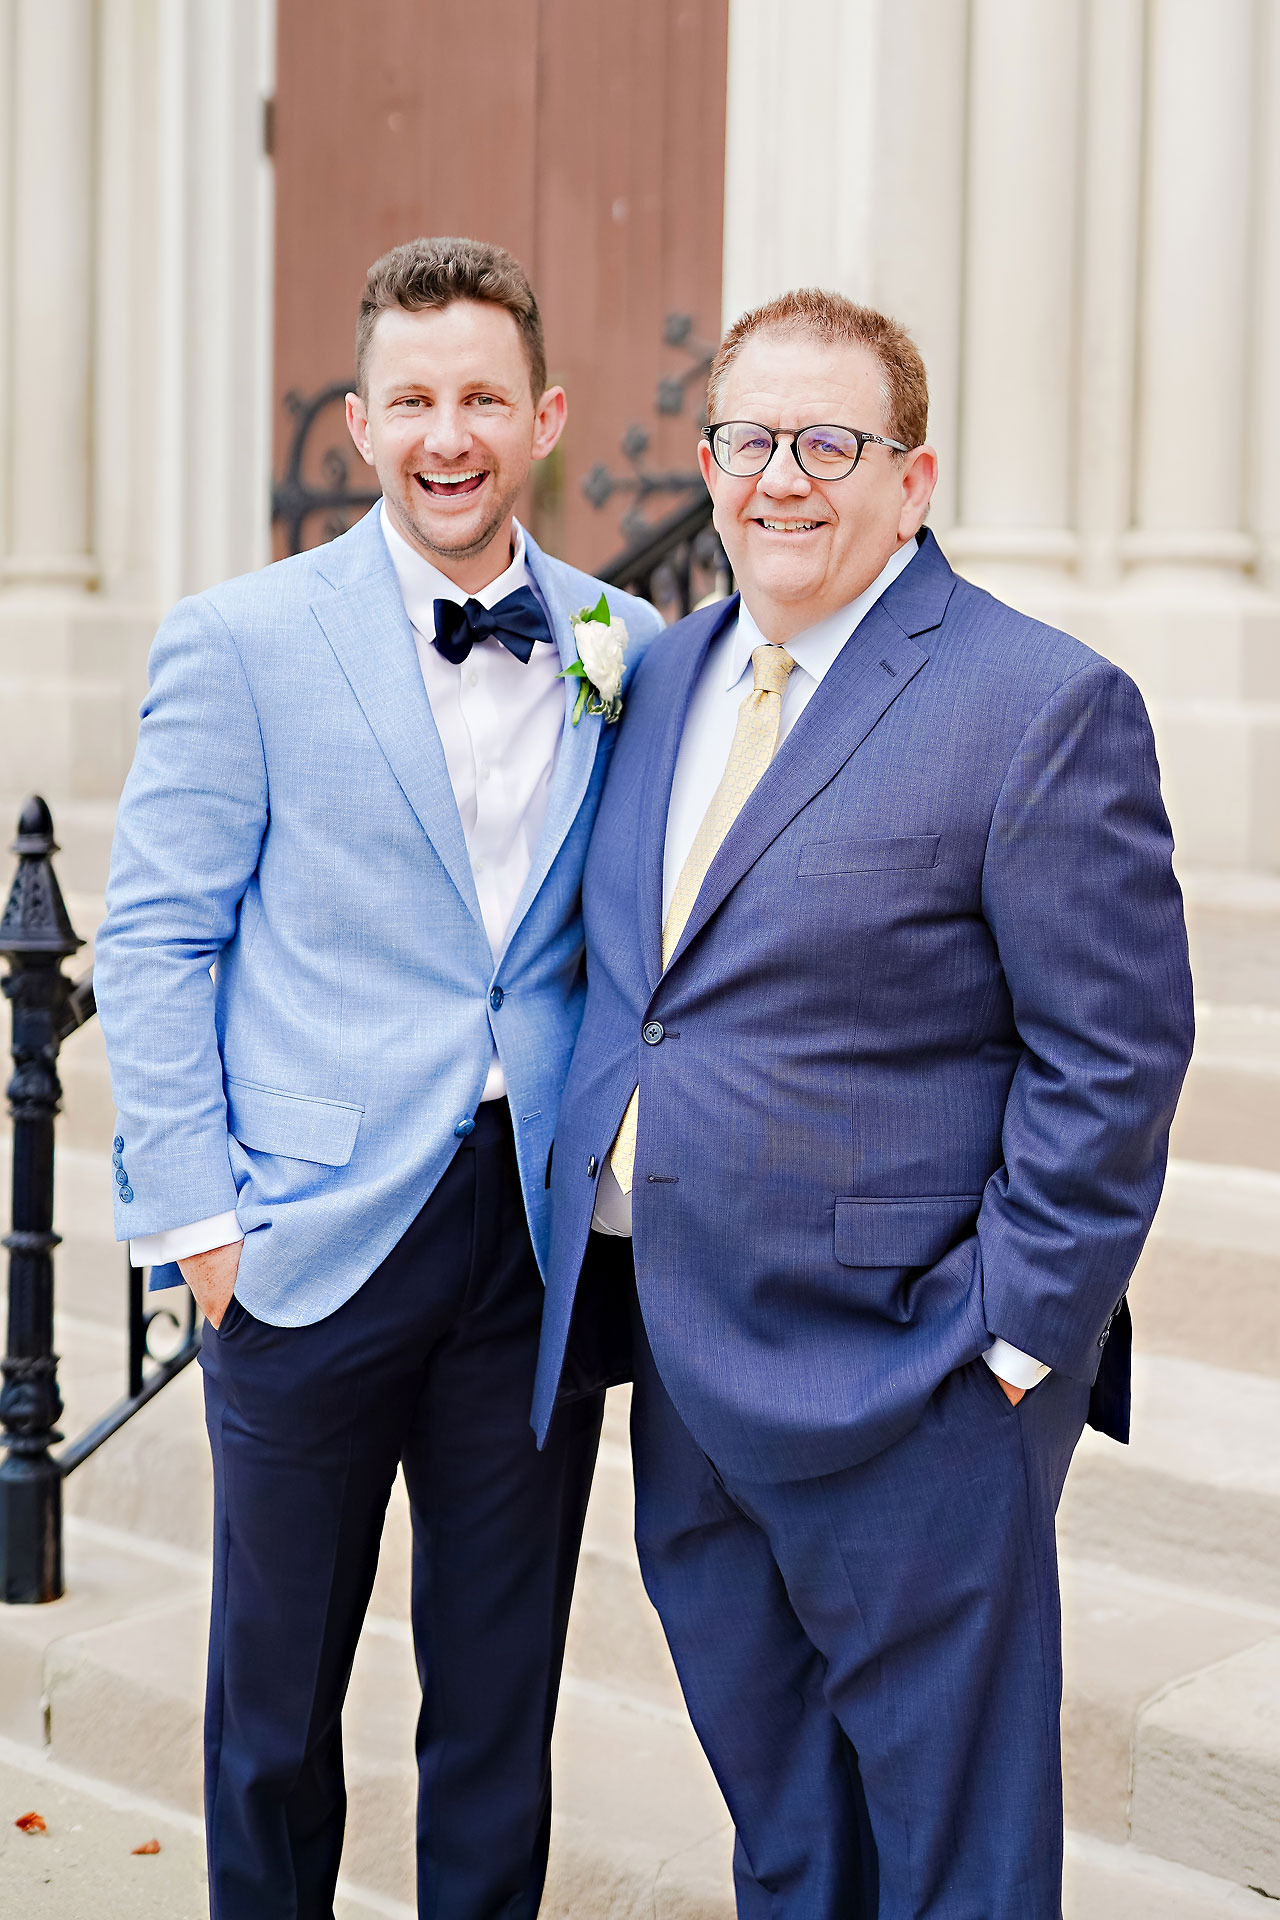 Sammi Jack Regions Tower JPS Events Indianapolis Wedding 153